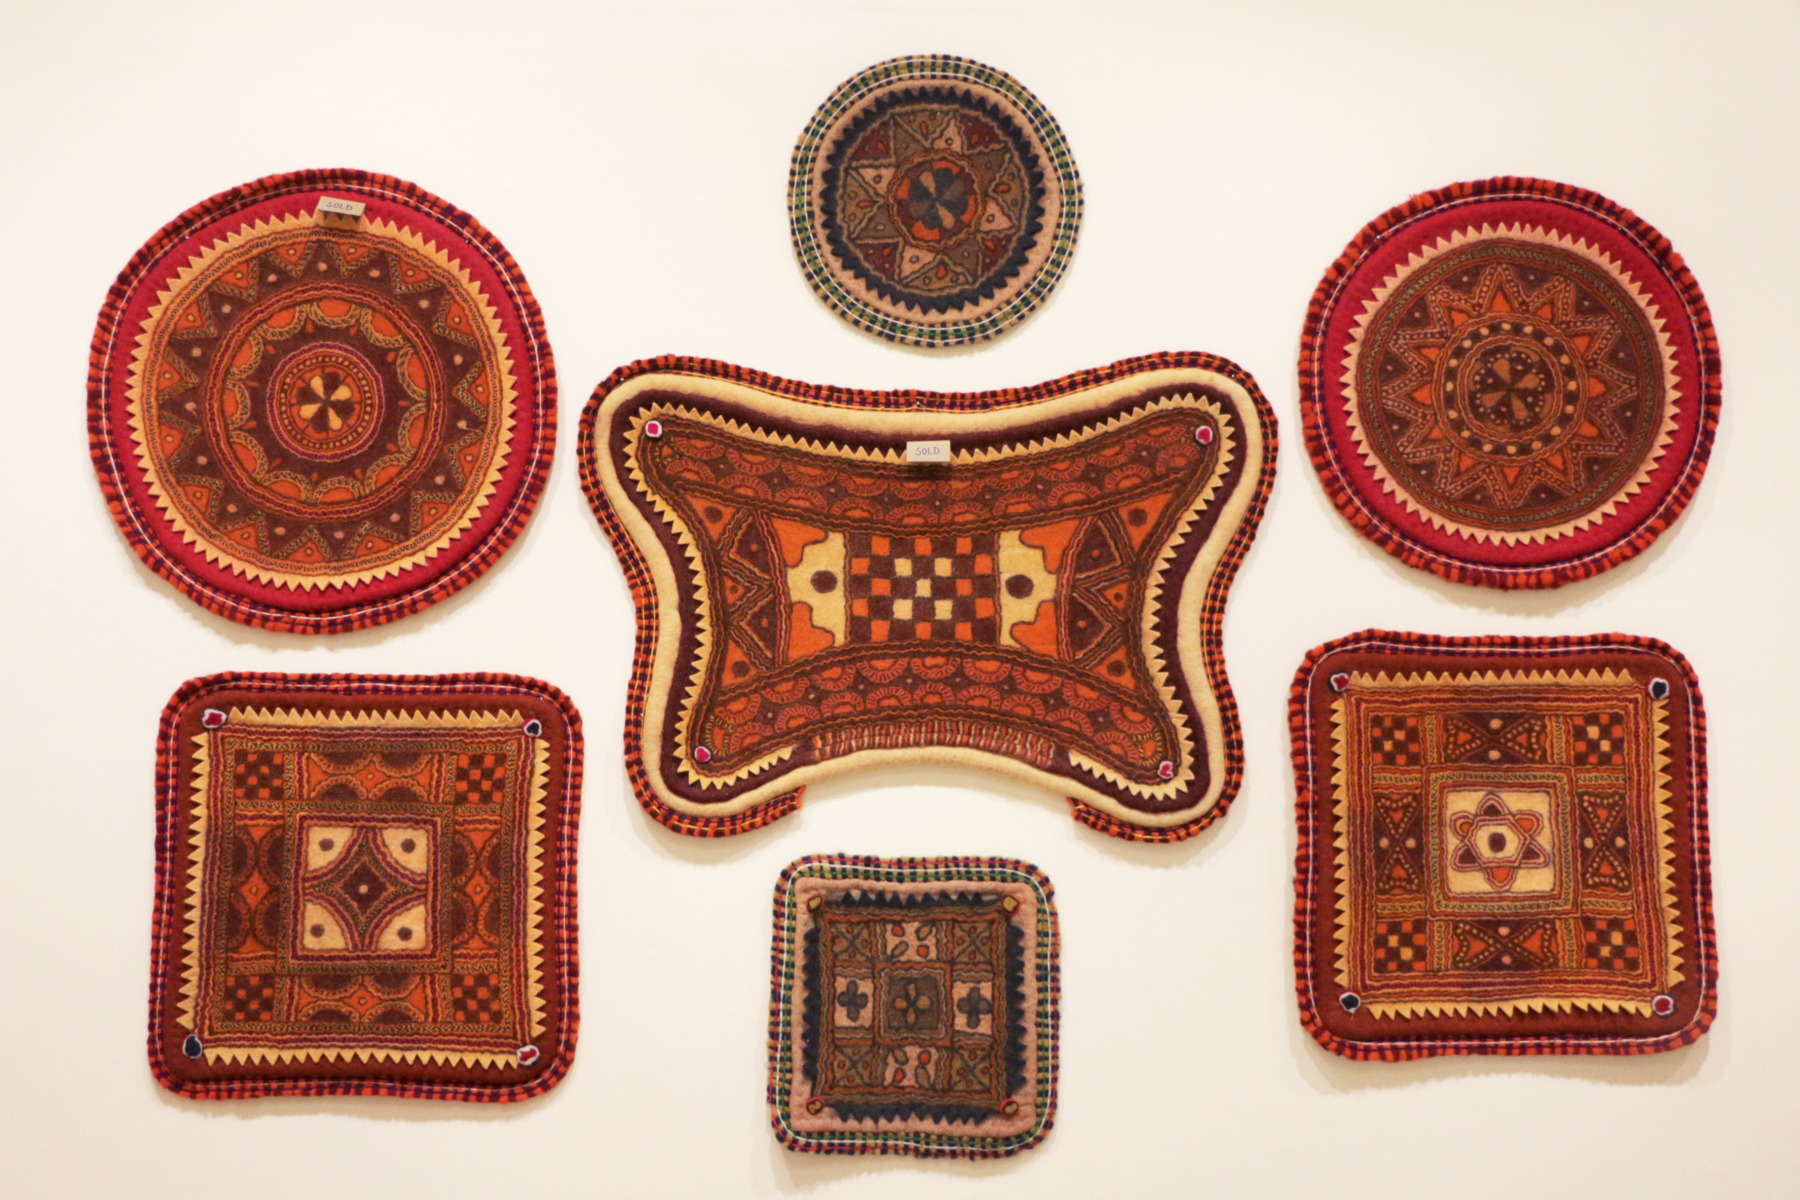 Namda Saddles and mats, exquisite pieces of wall art